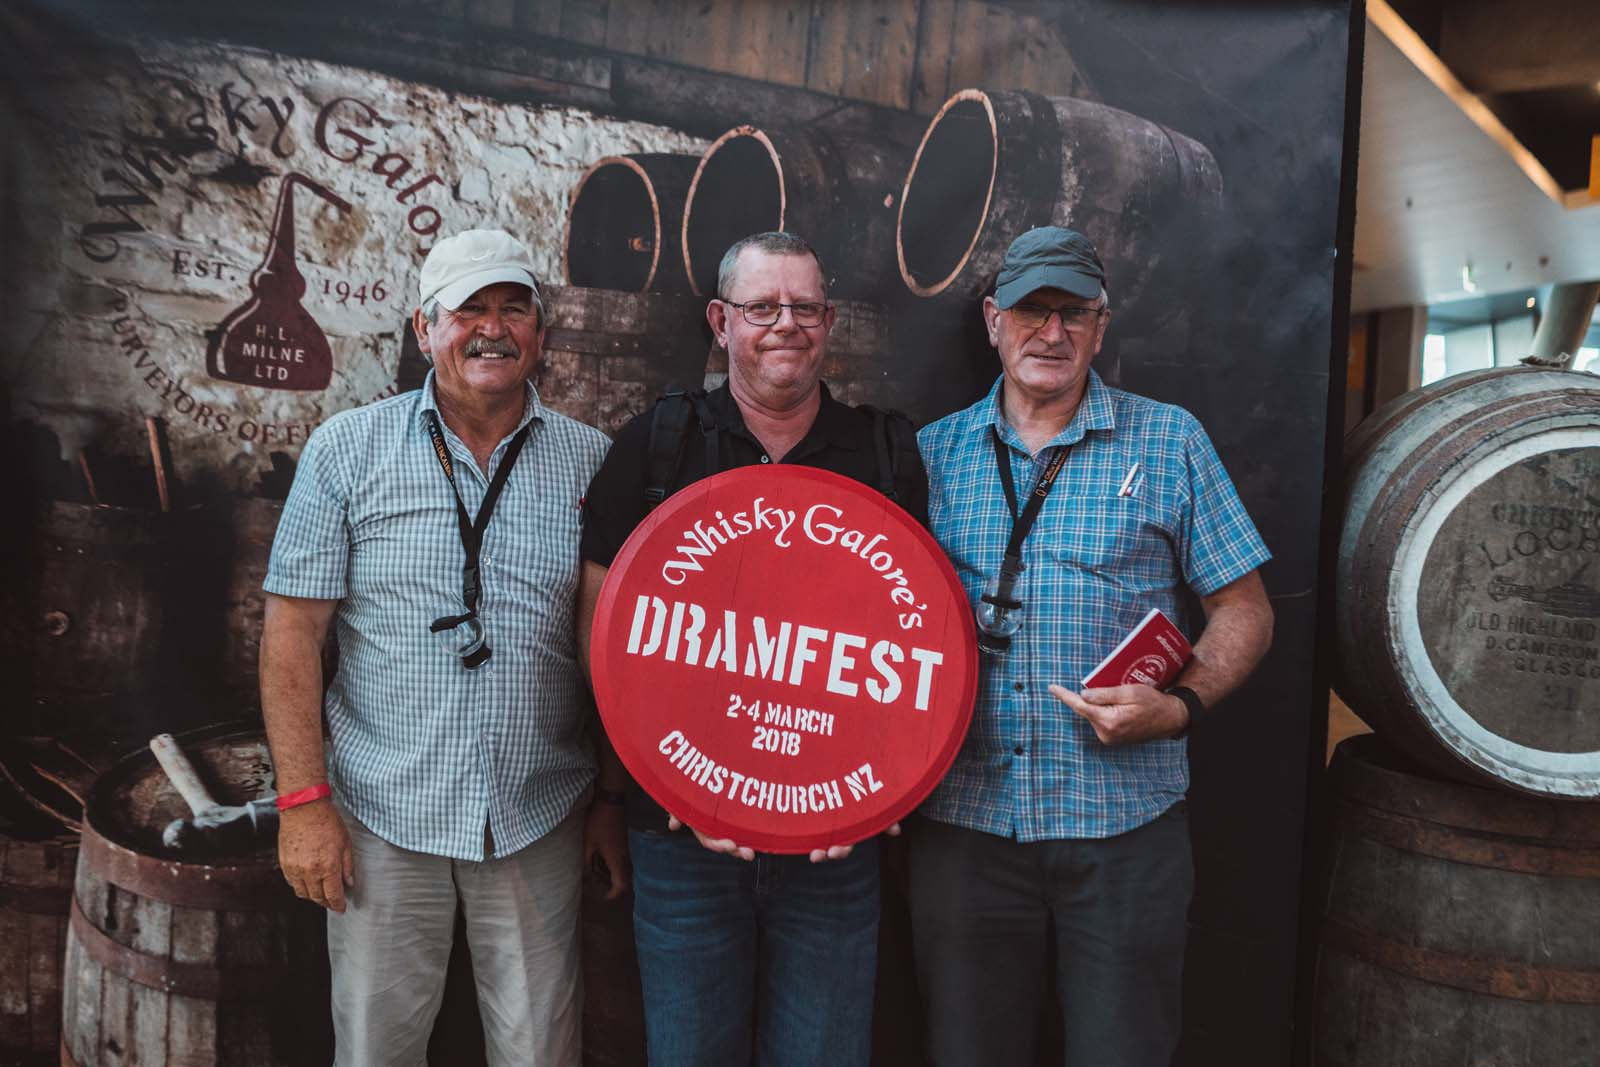 Dramfest 2018 for Whisky Galore-130.jpg